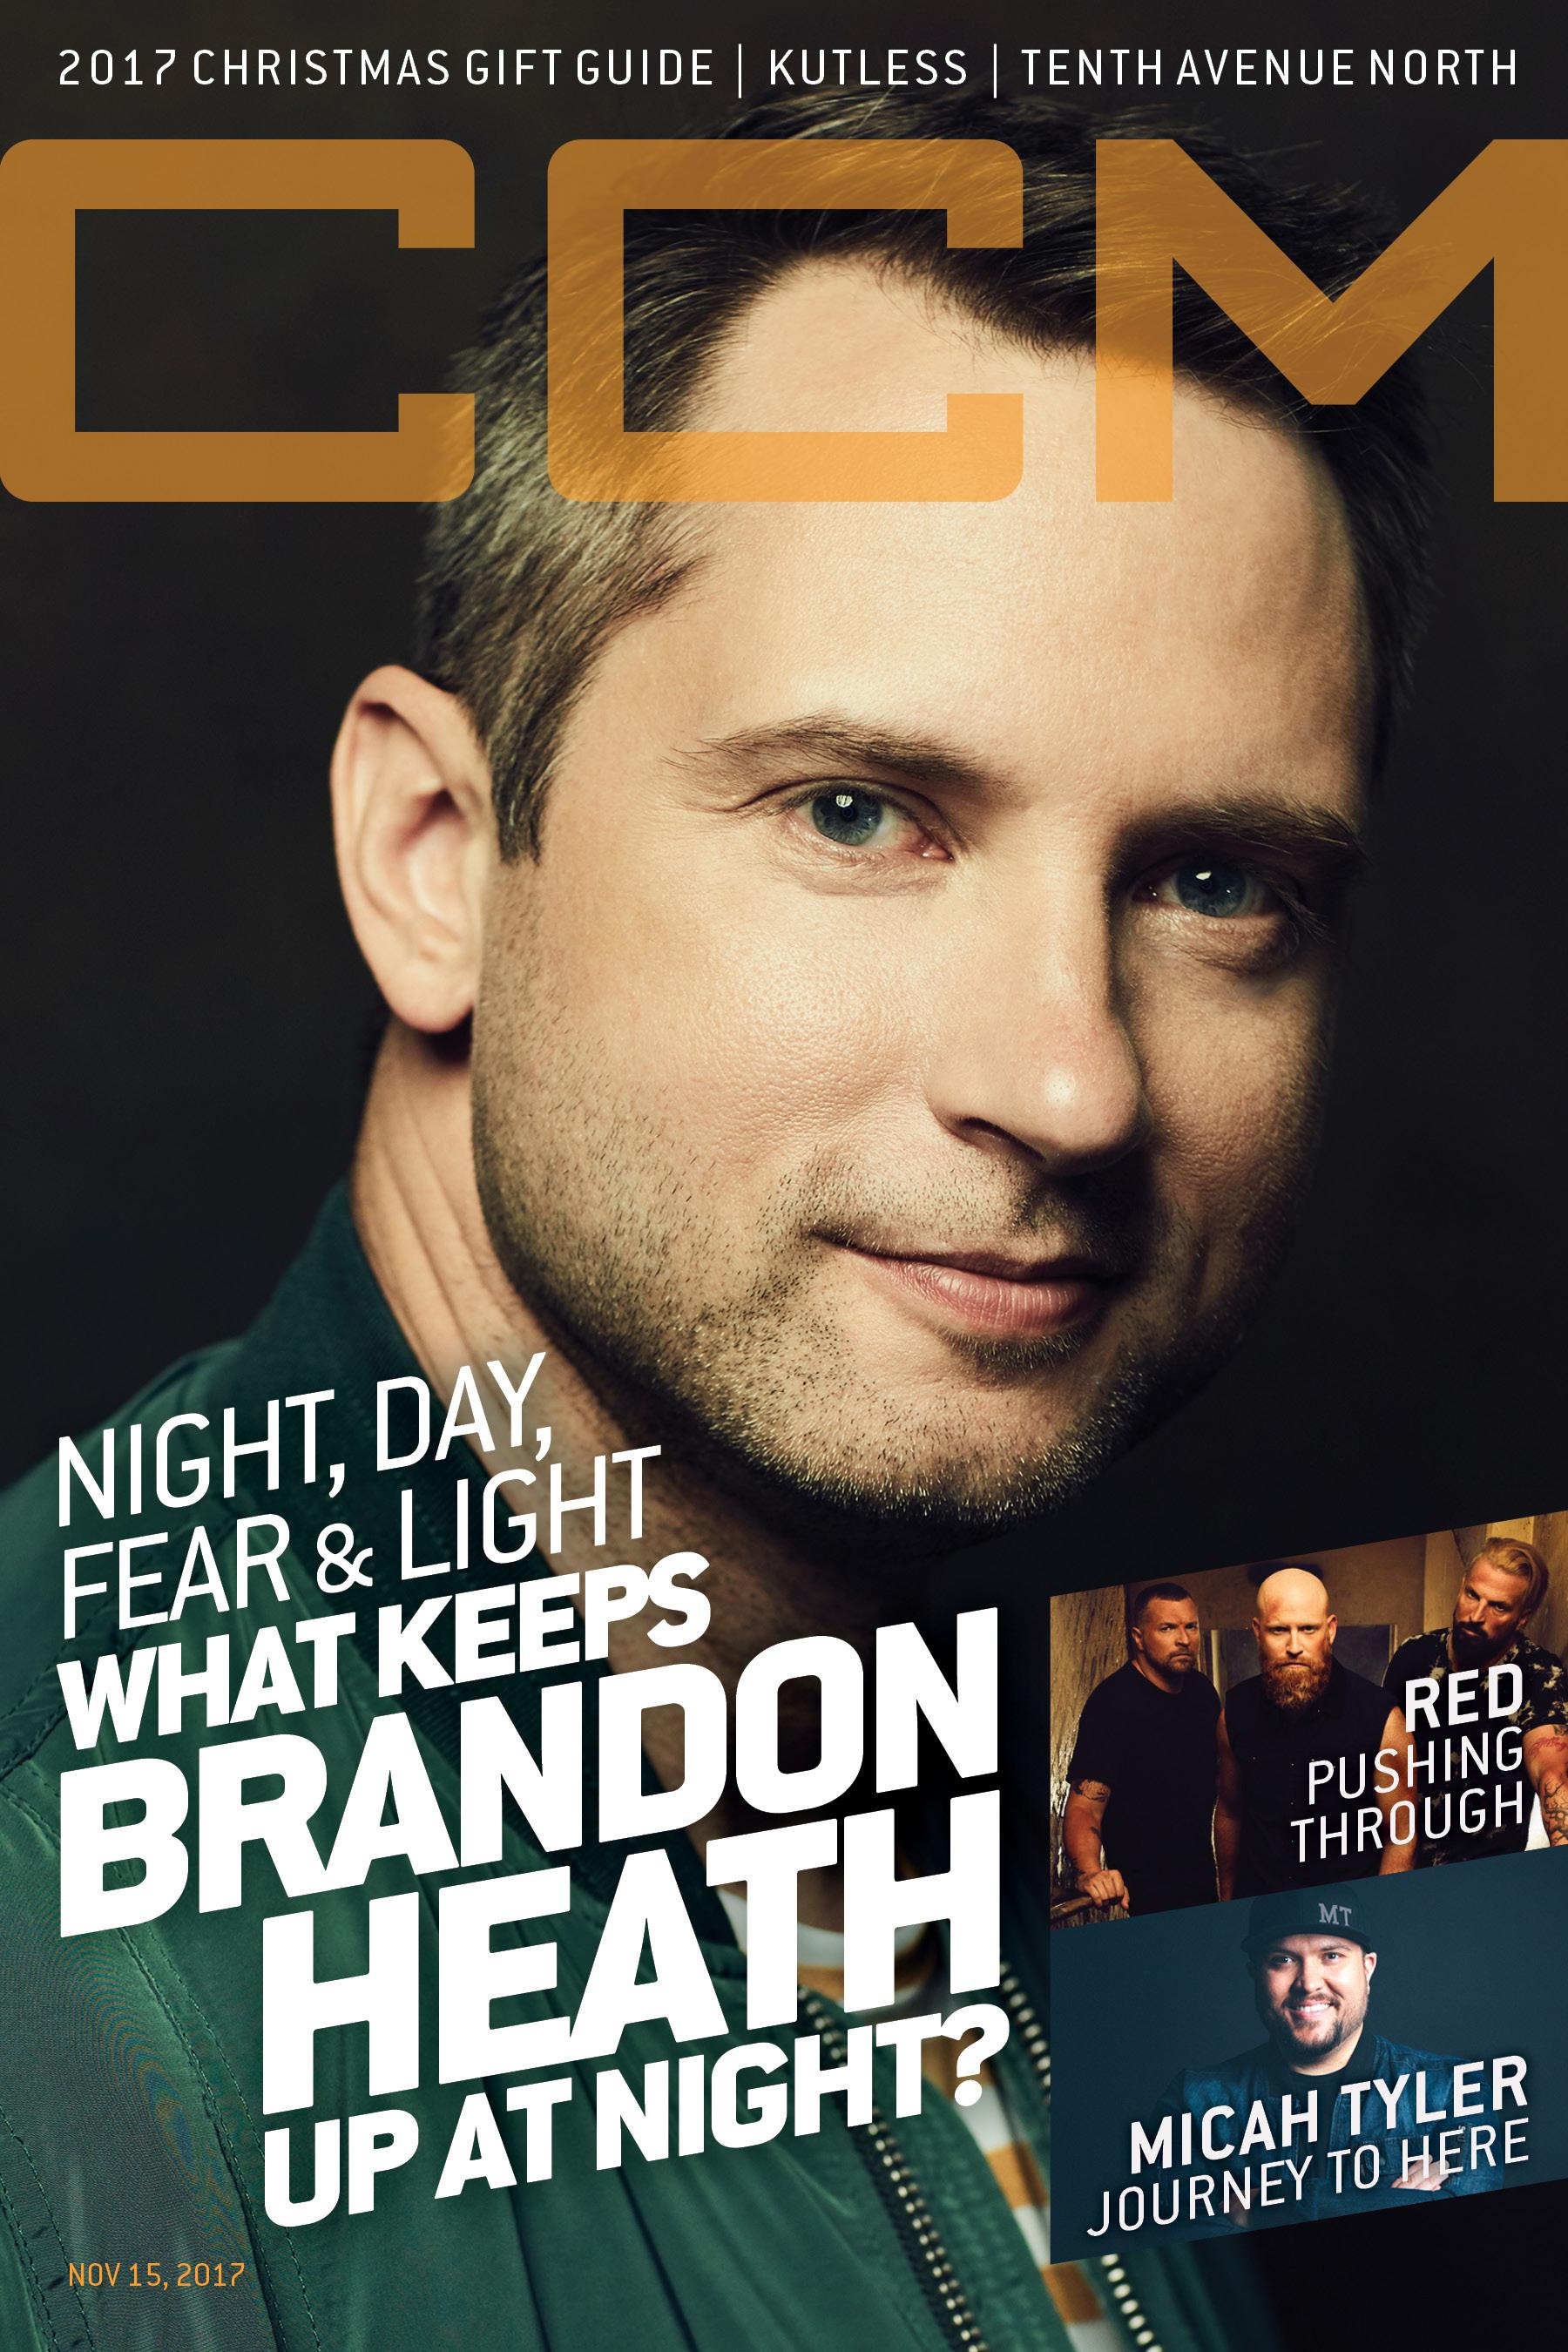 Brandon Heath, CCM Magazine - image